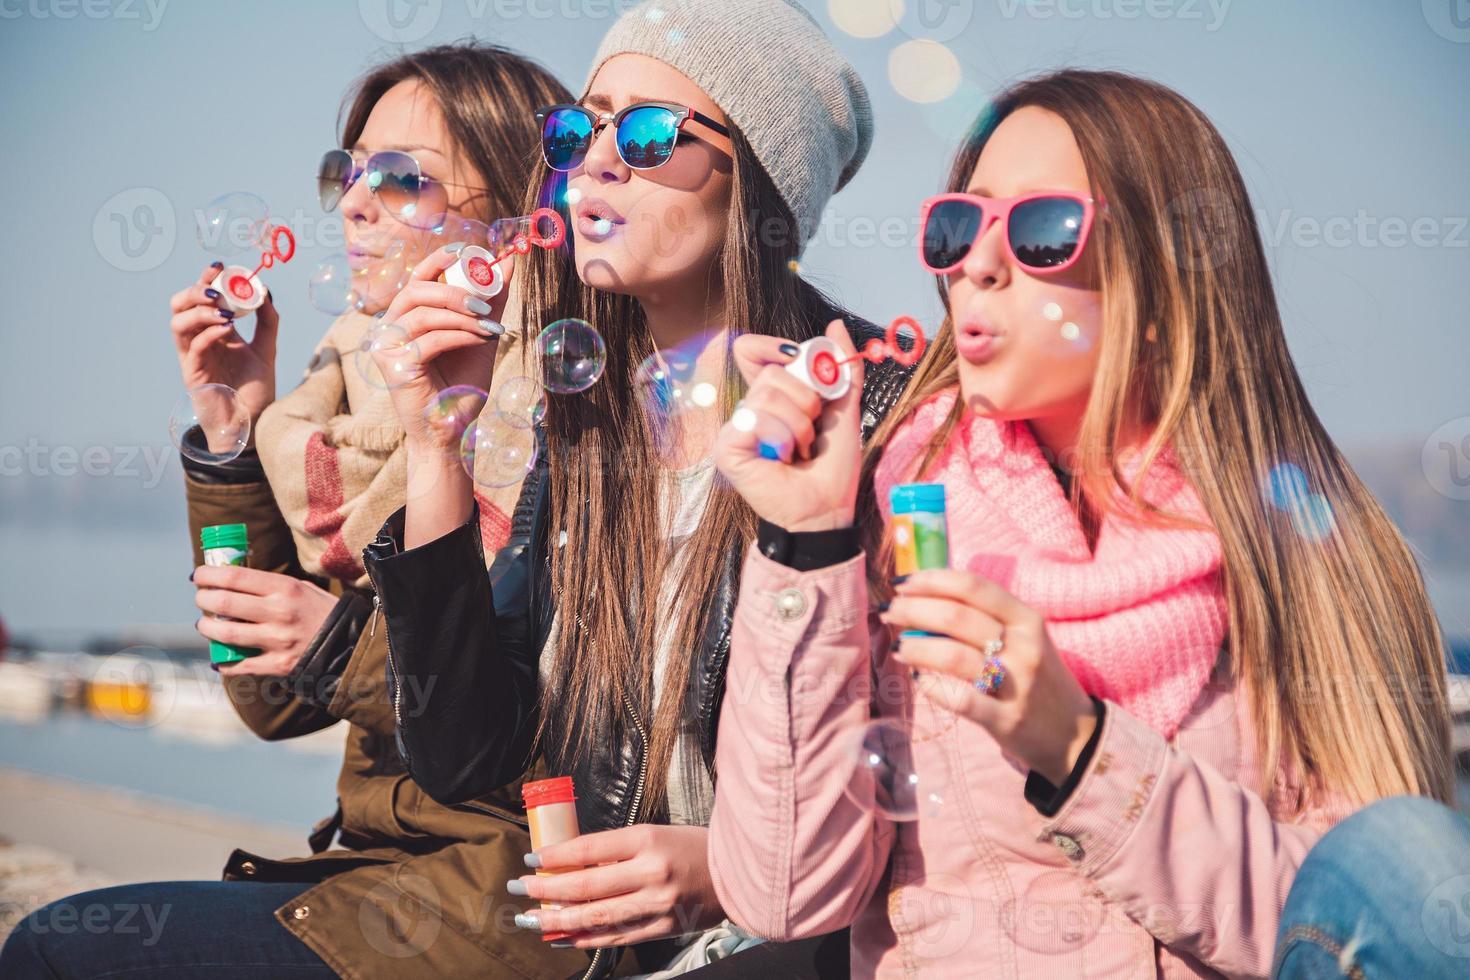 Freundinnen blasen Seifenblasen foto